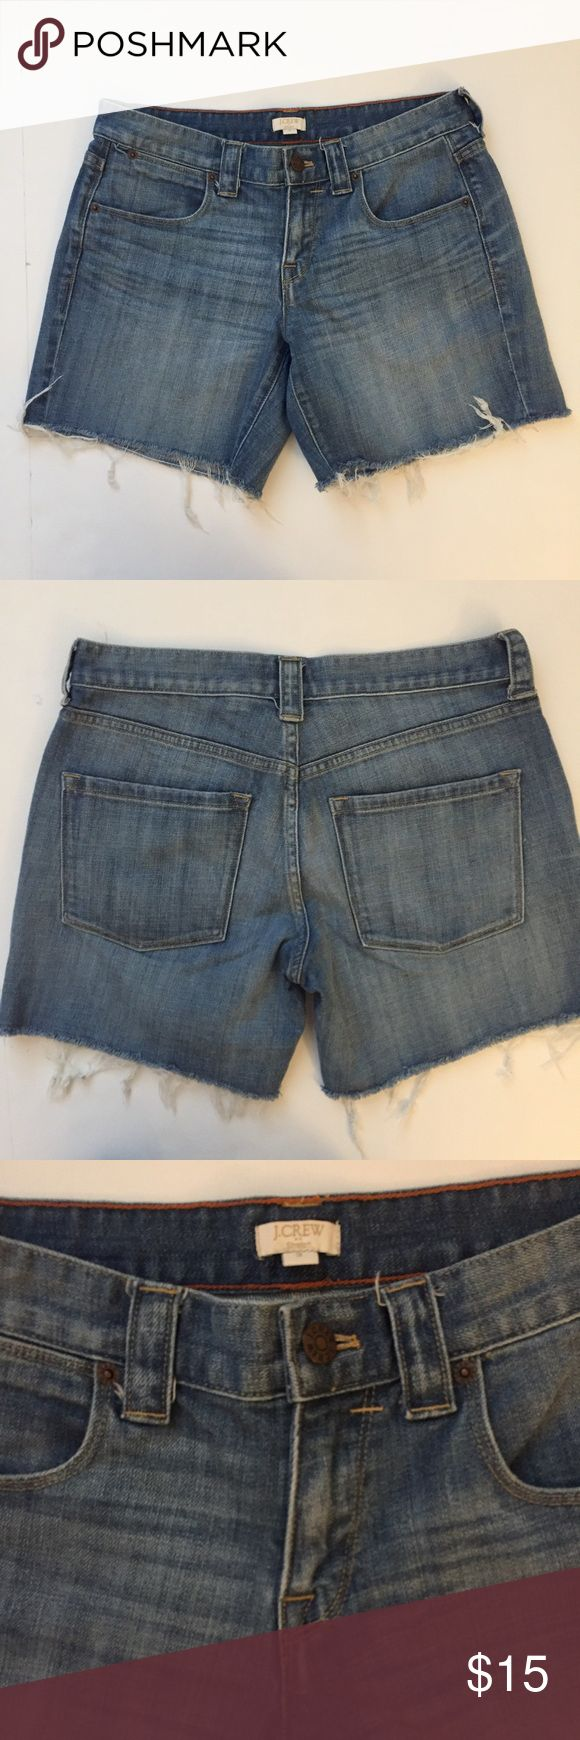 "J Crew Factory denim cutoff shorts size 2 Great condition J Crew factory cutoff denim shorts. Length 13.75"". Waist 26"".    Size 2. J. Crew Shorts Jean Shorts"